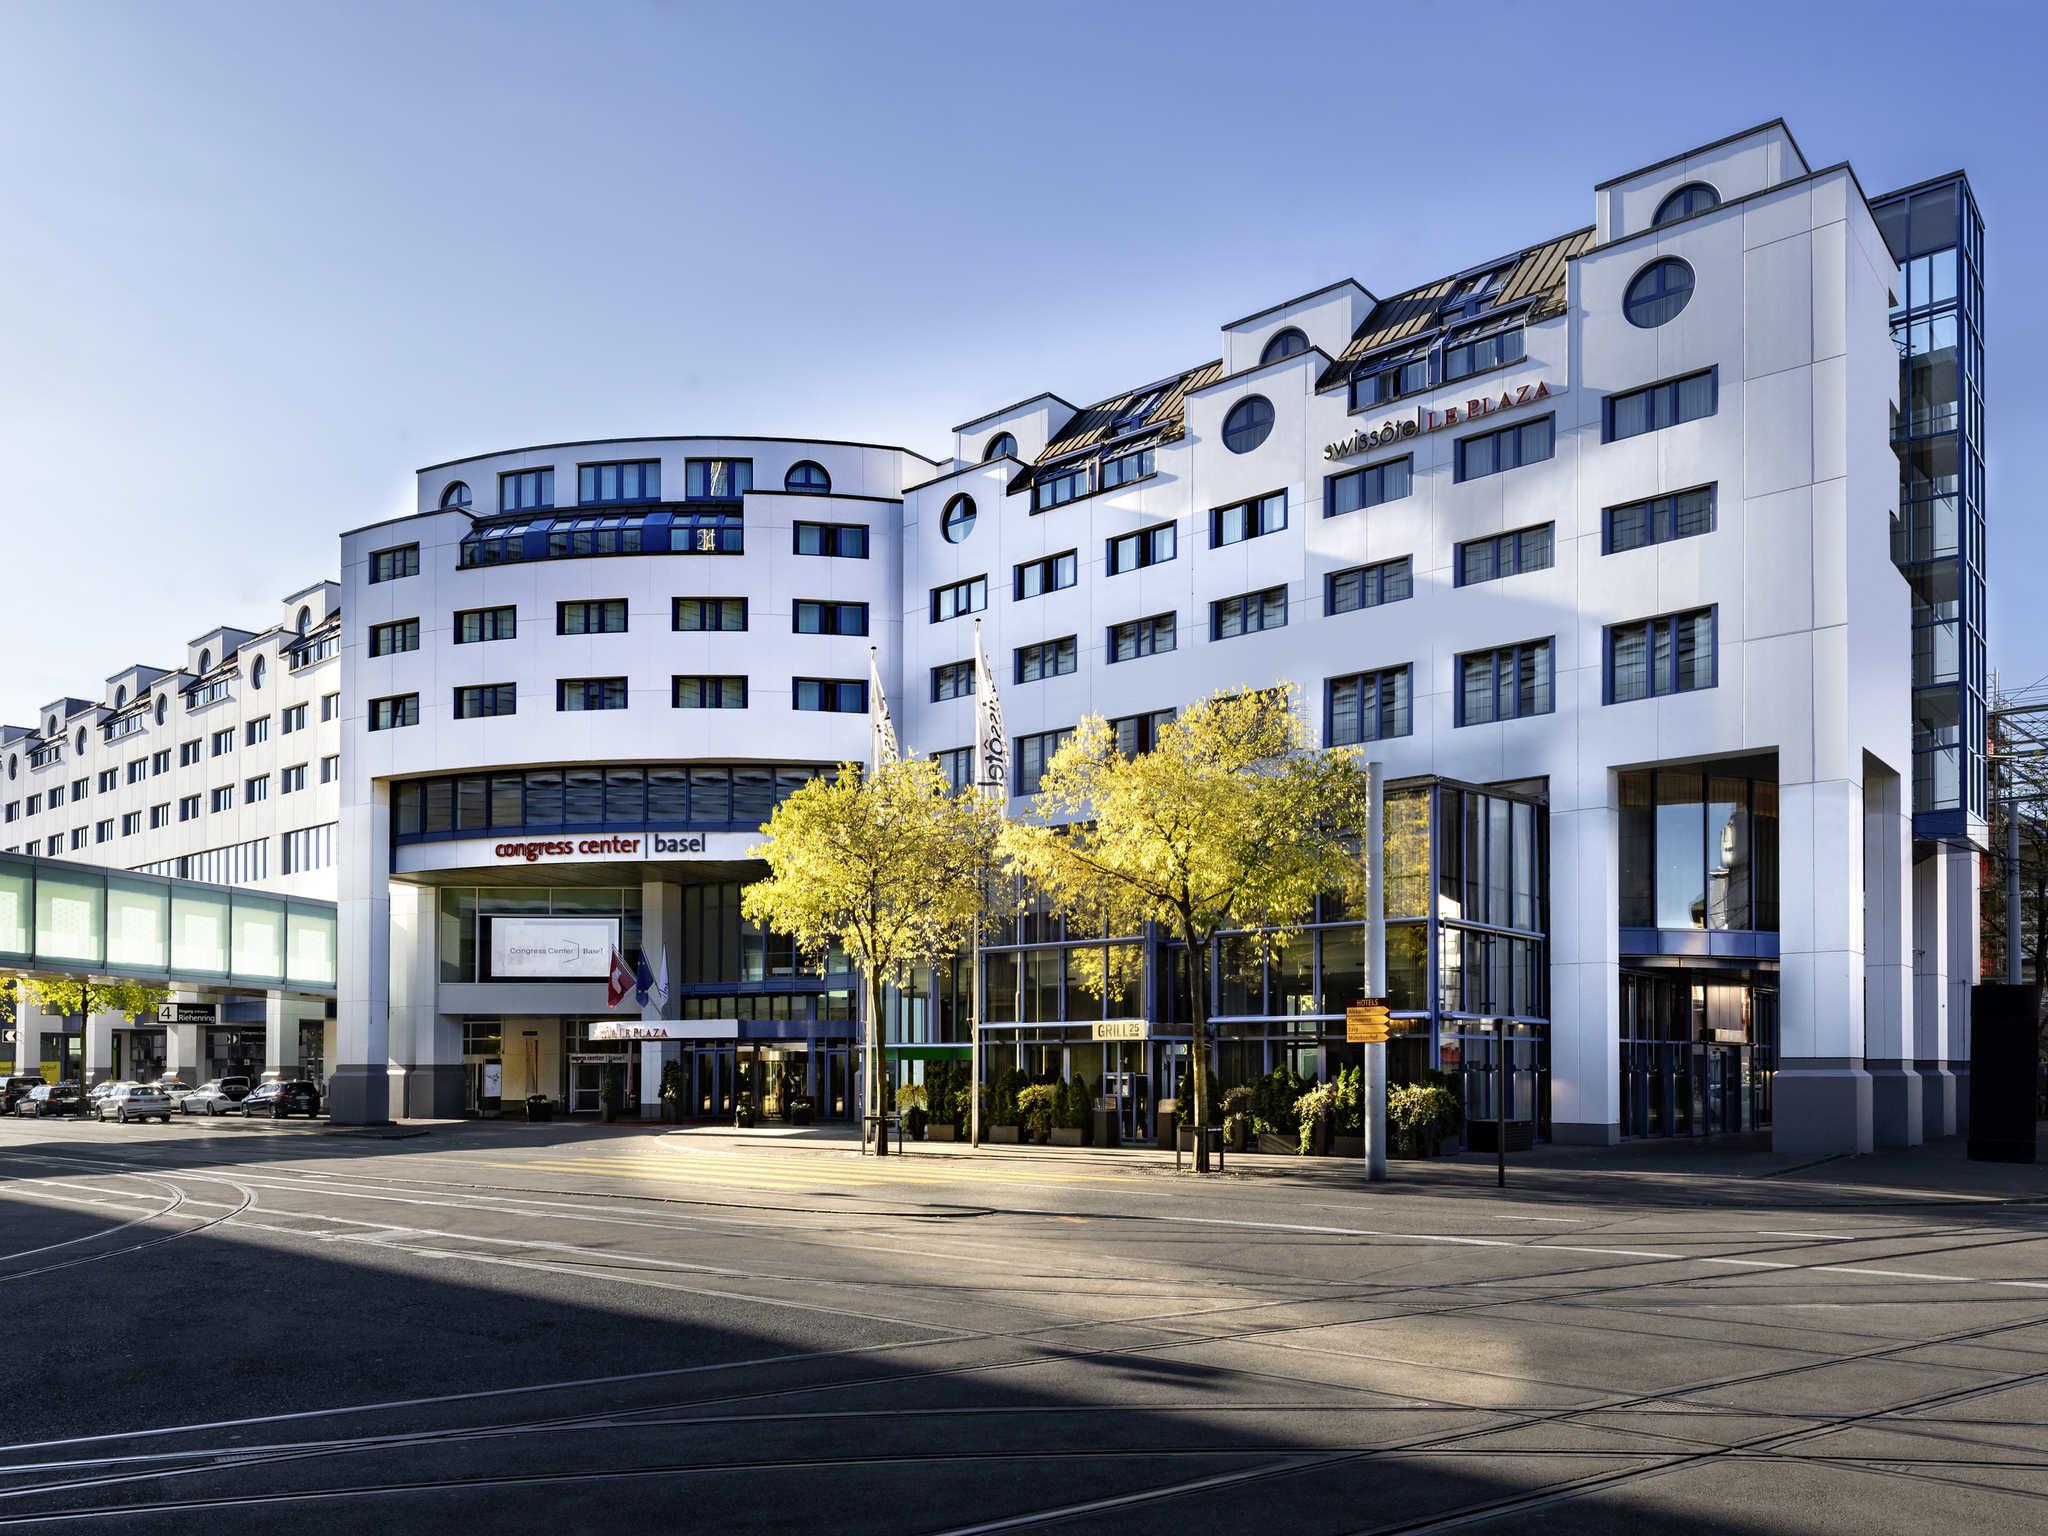 Hotell – Swissôtel Le Plaza Basel